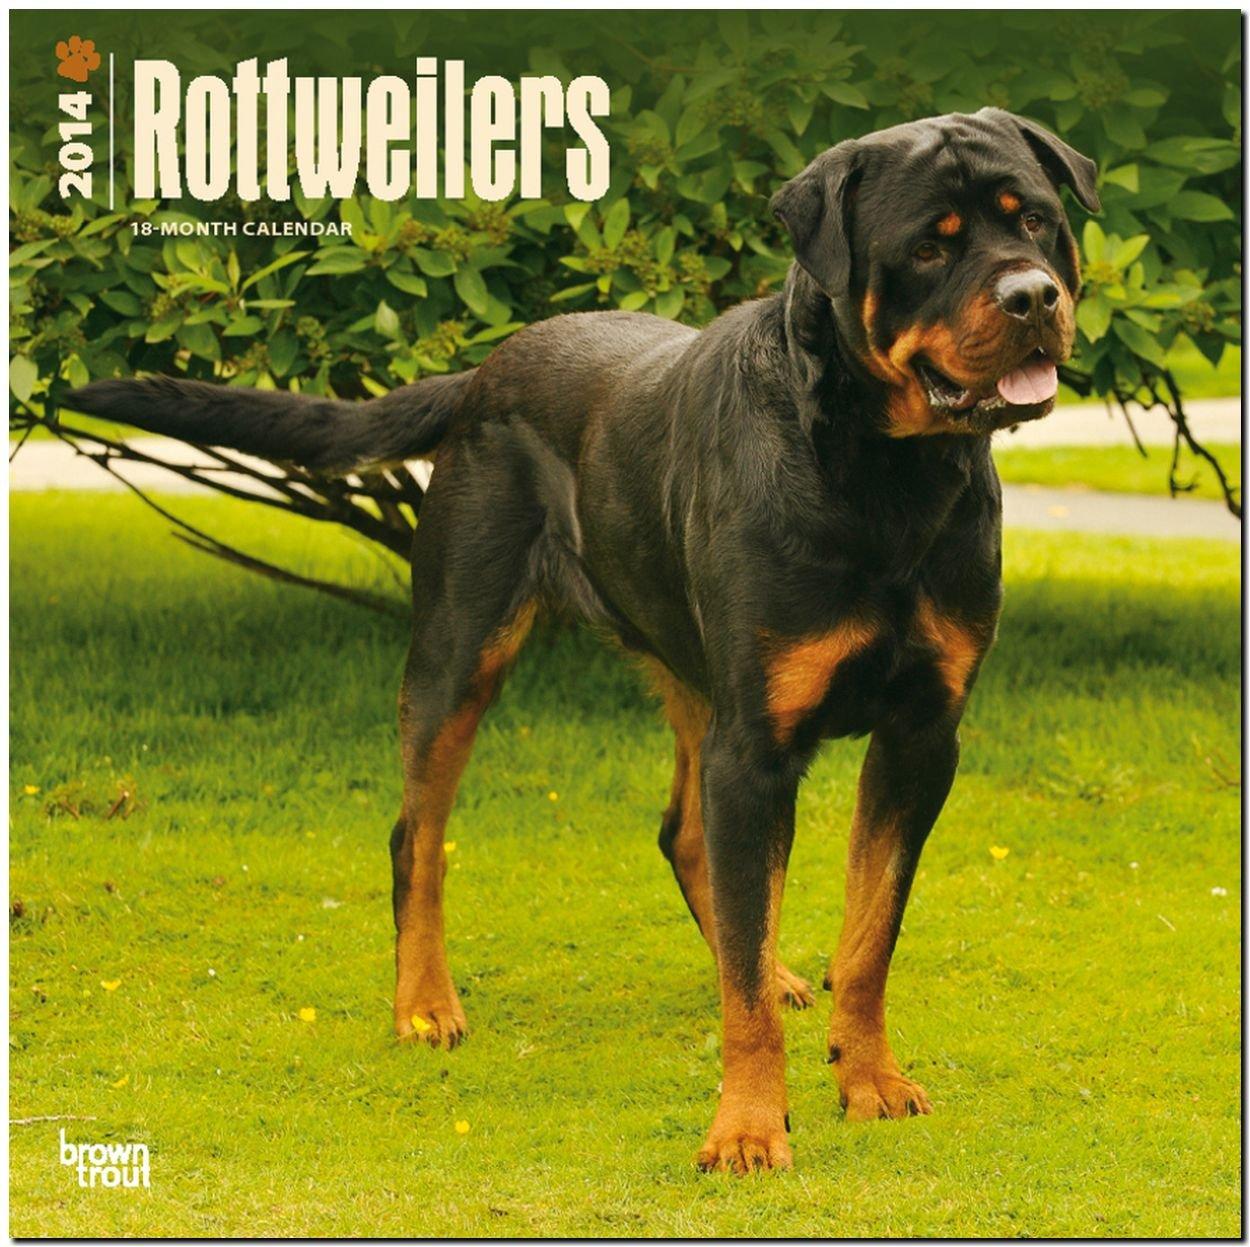 Rottweilers 2014 - Rottweiler: Original BrownTrout-Kalender [Mehrsprachig] [Kalender]